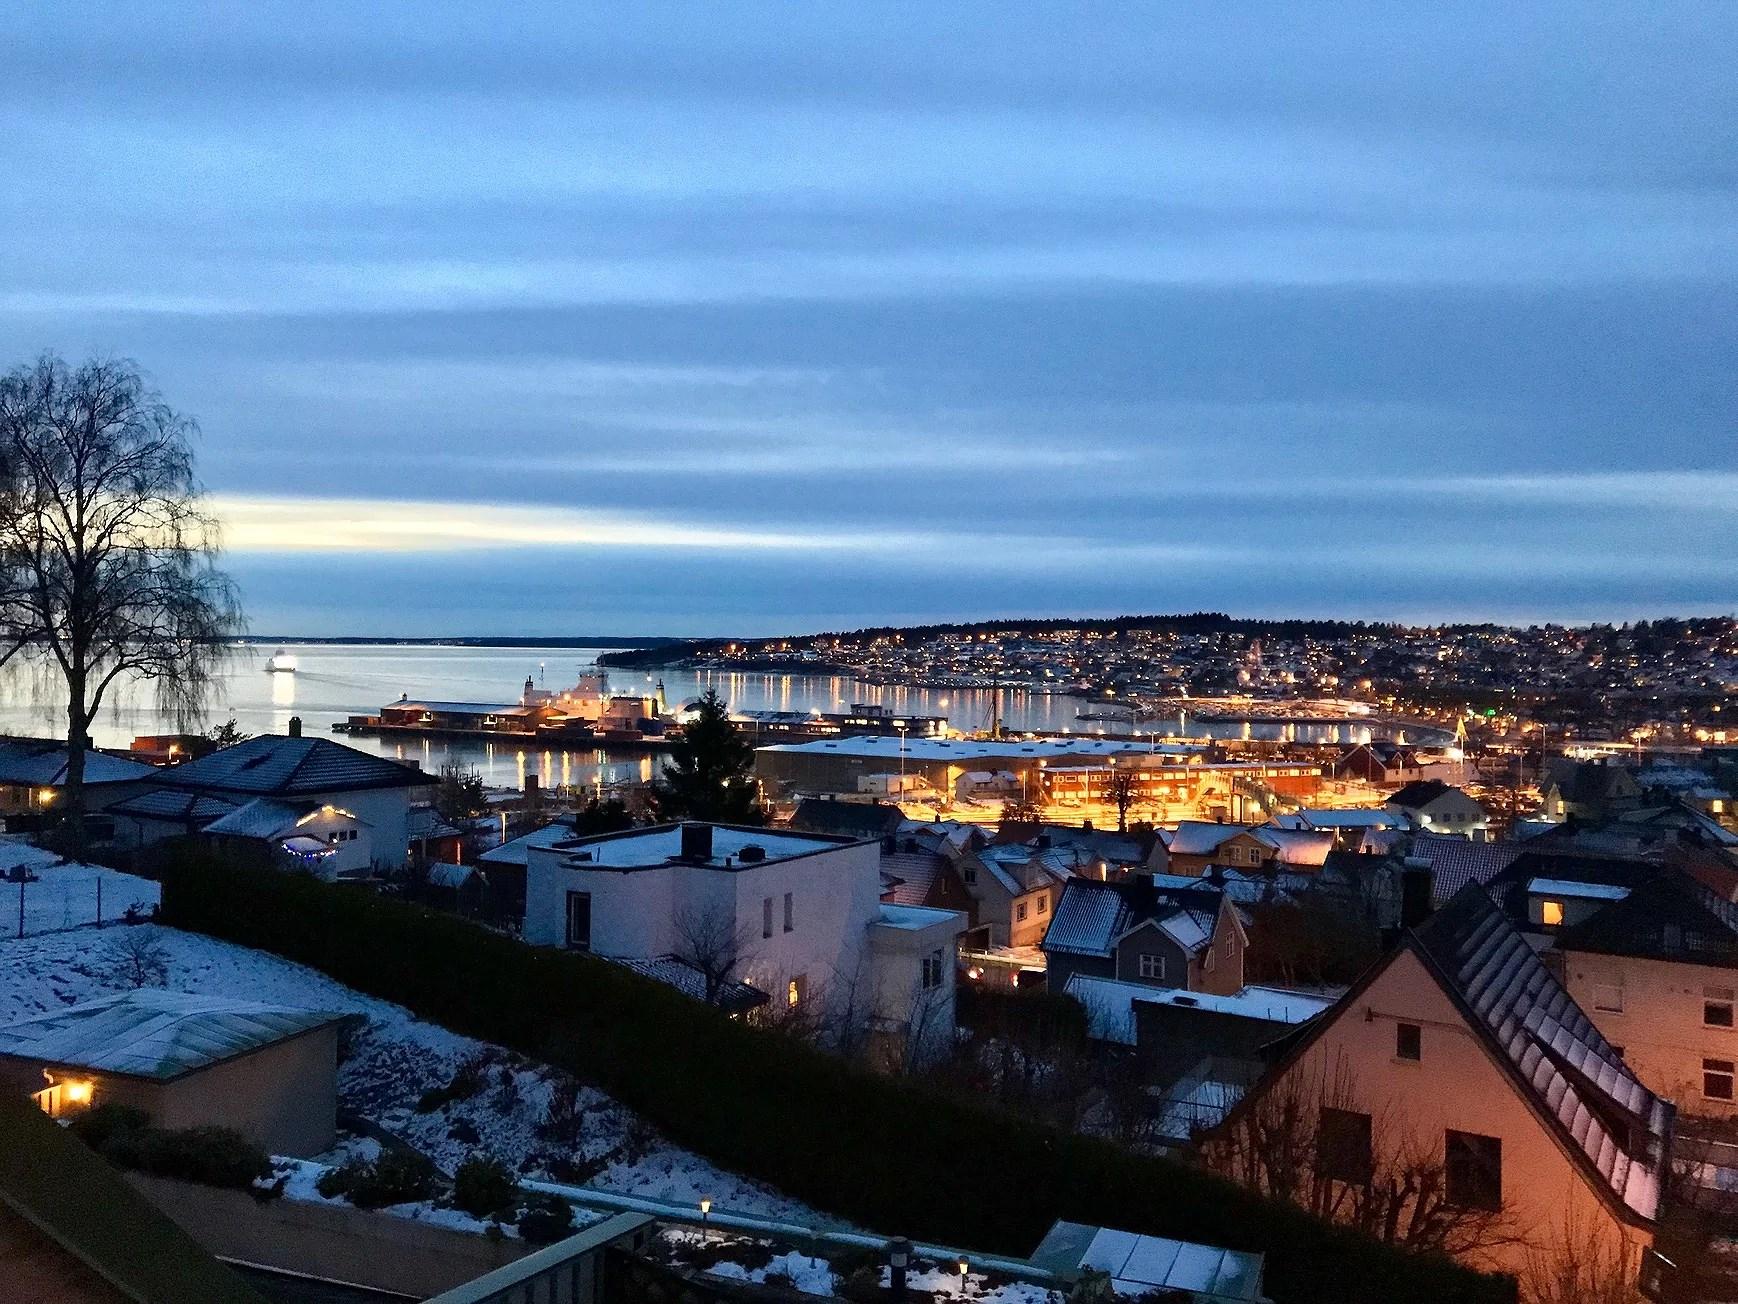 MY CITY VIEW